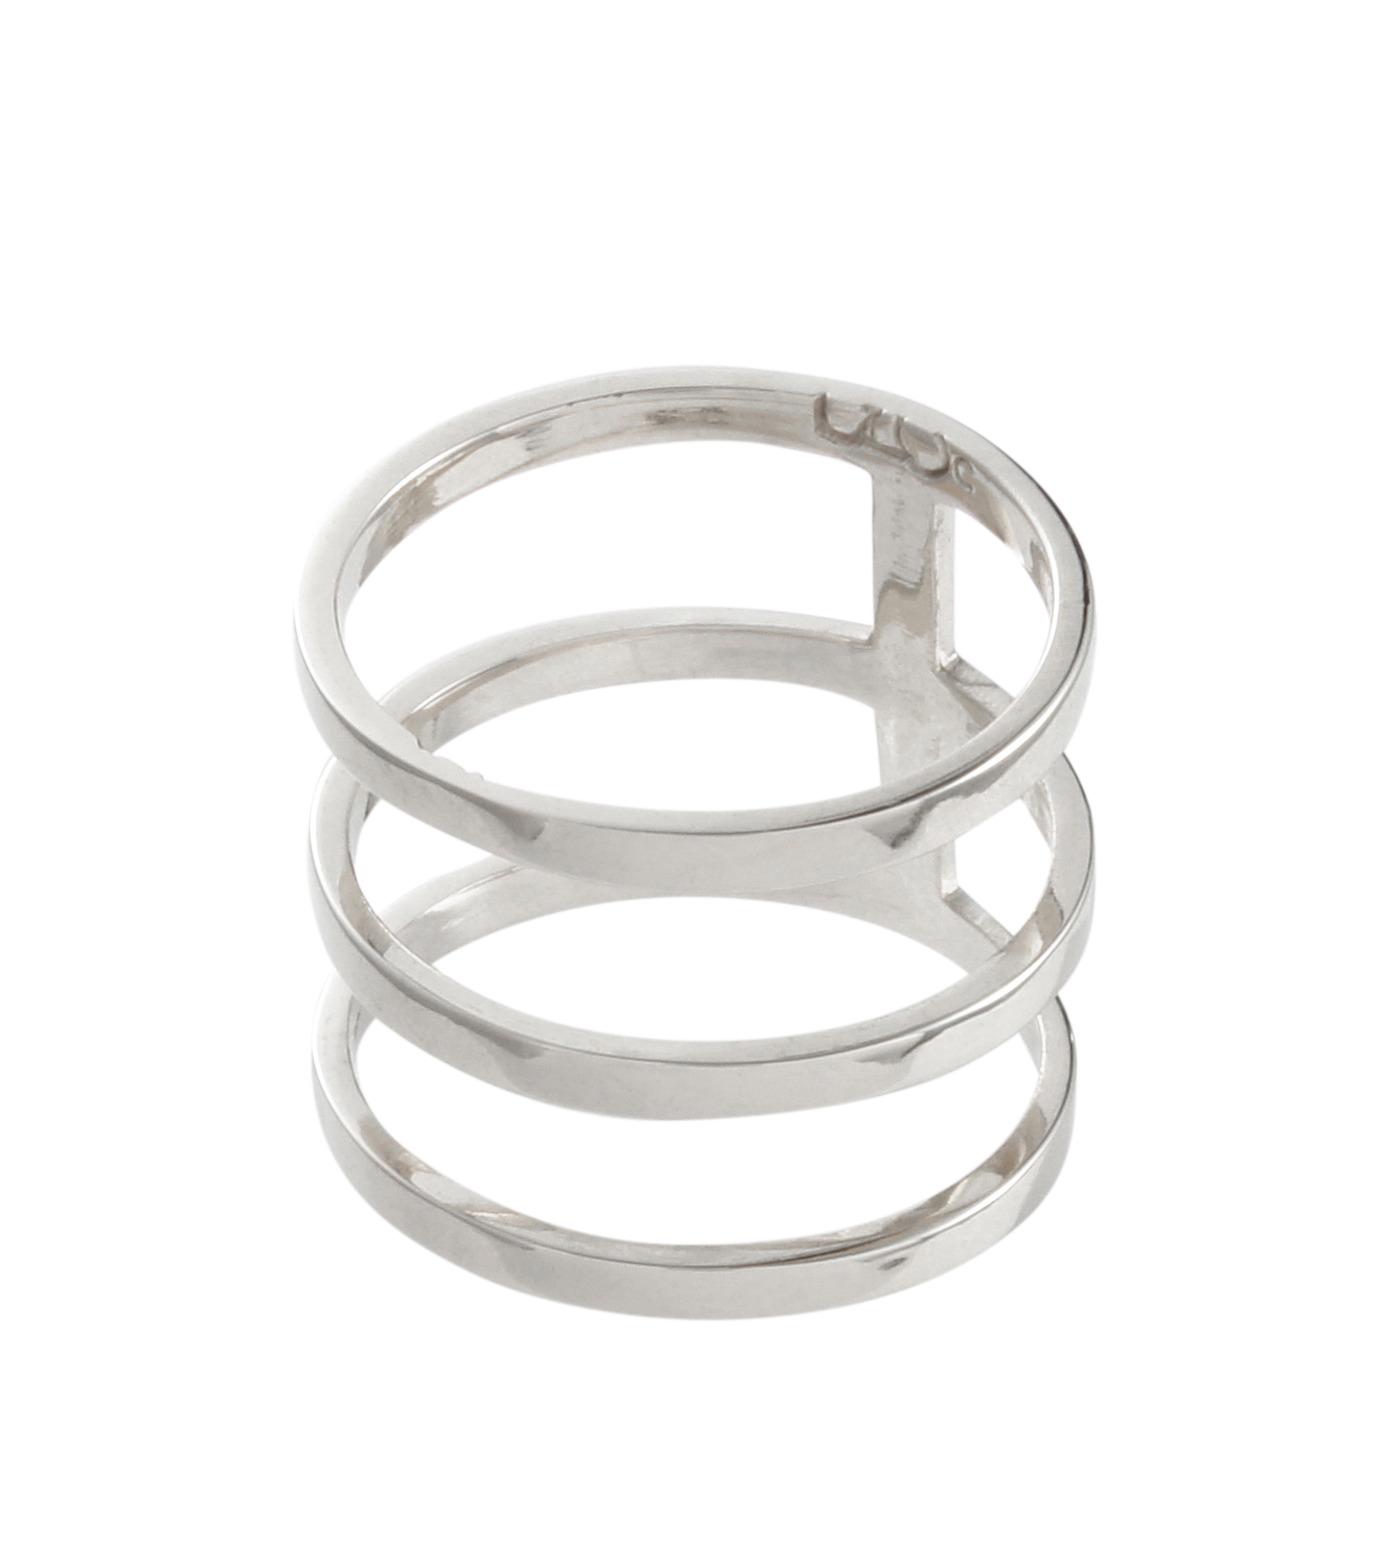 Campbell(キャンベル)のTribar Ring-SILVER(アクセサリー/accessory)-TRIBAR-RING-1 拡大詳細画像2